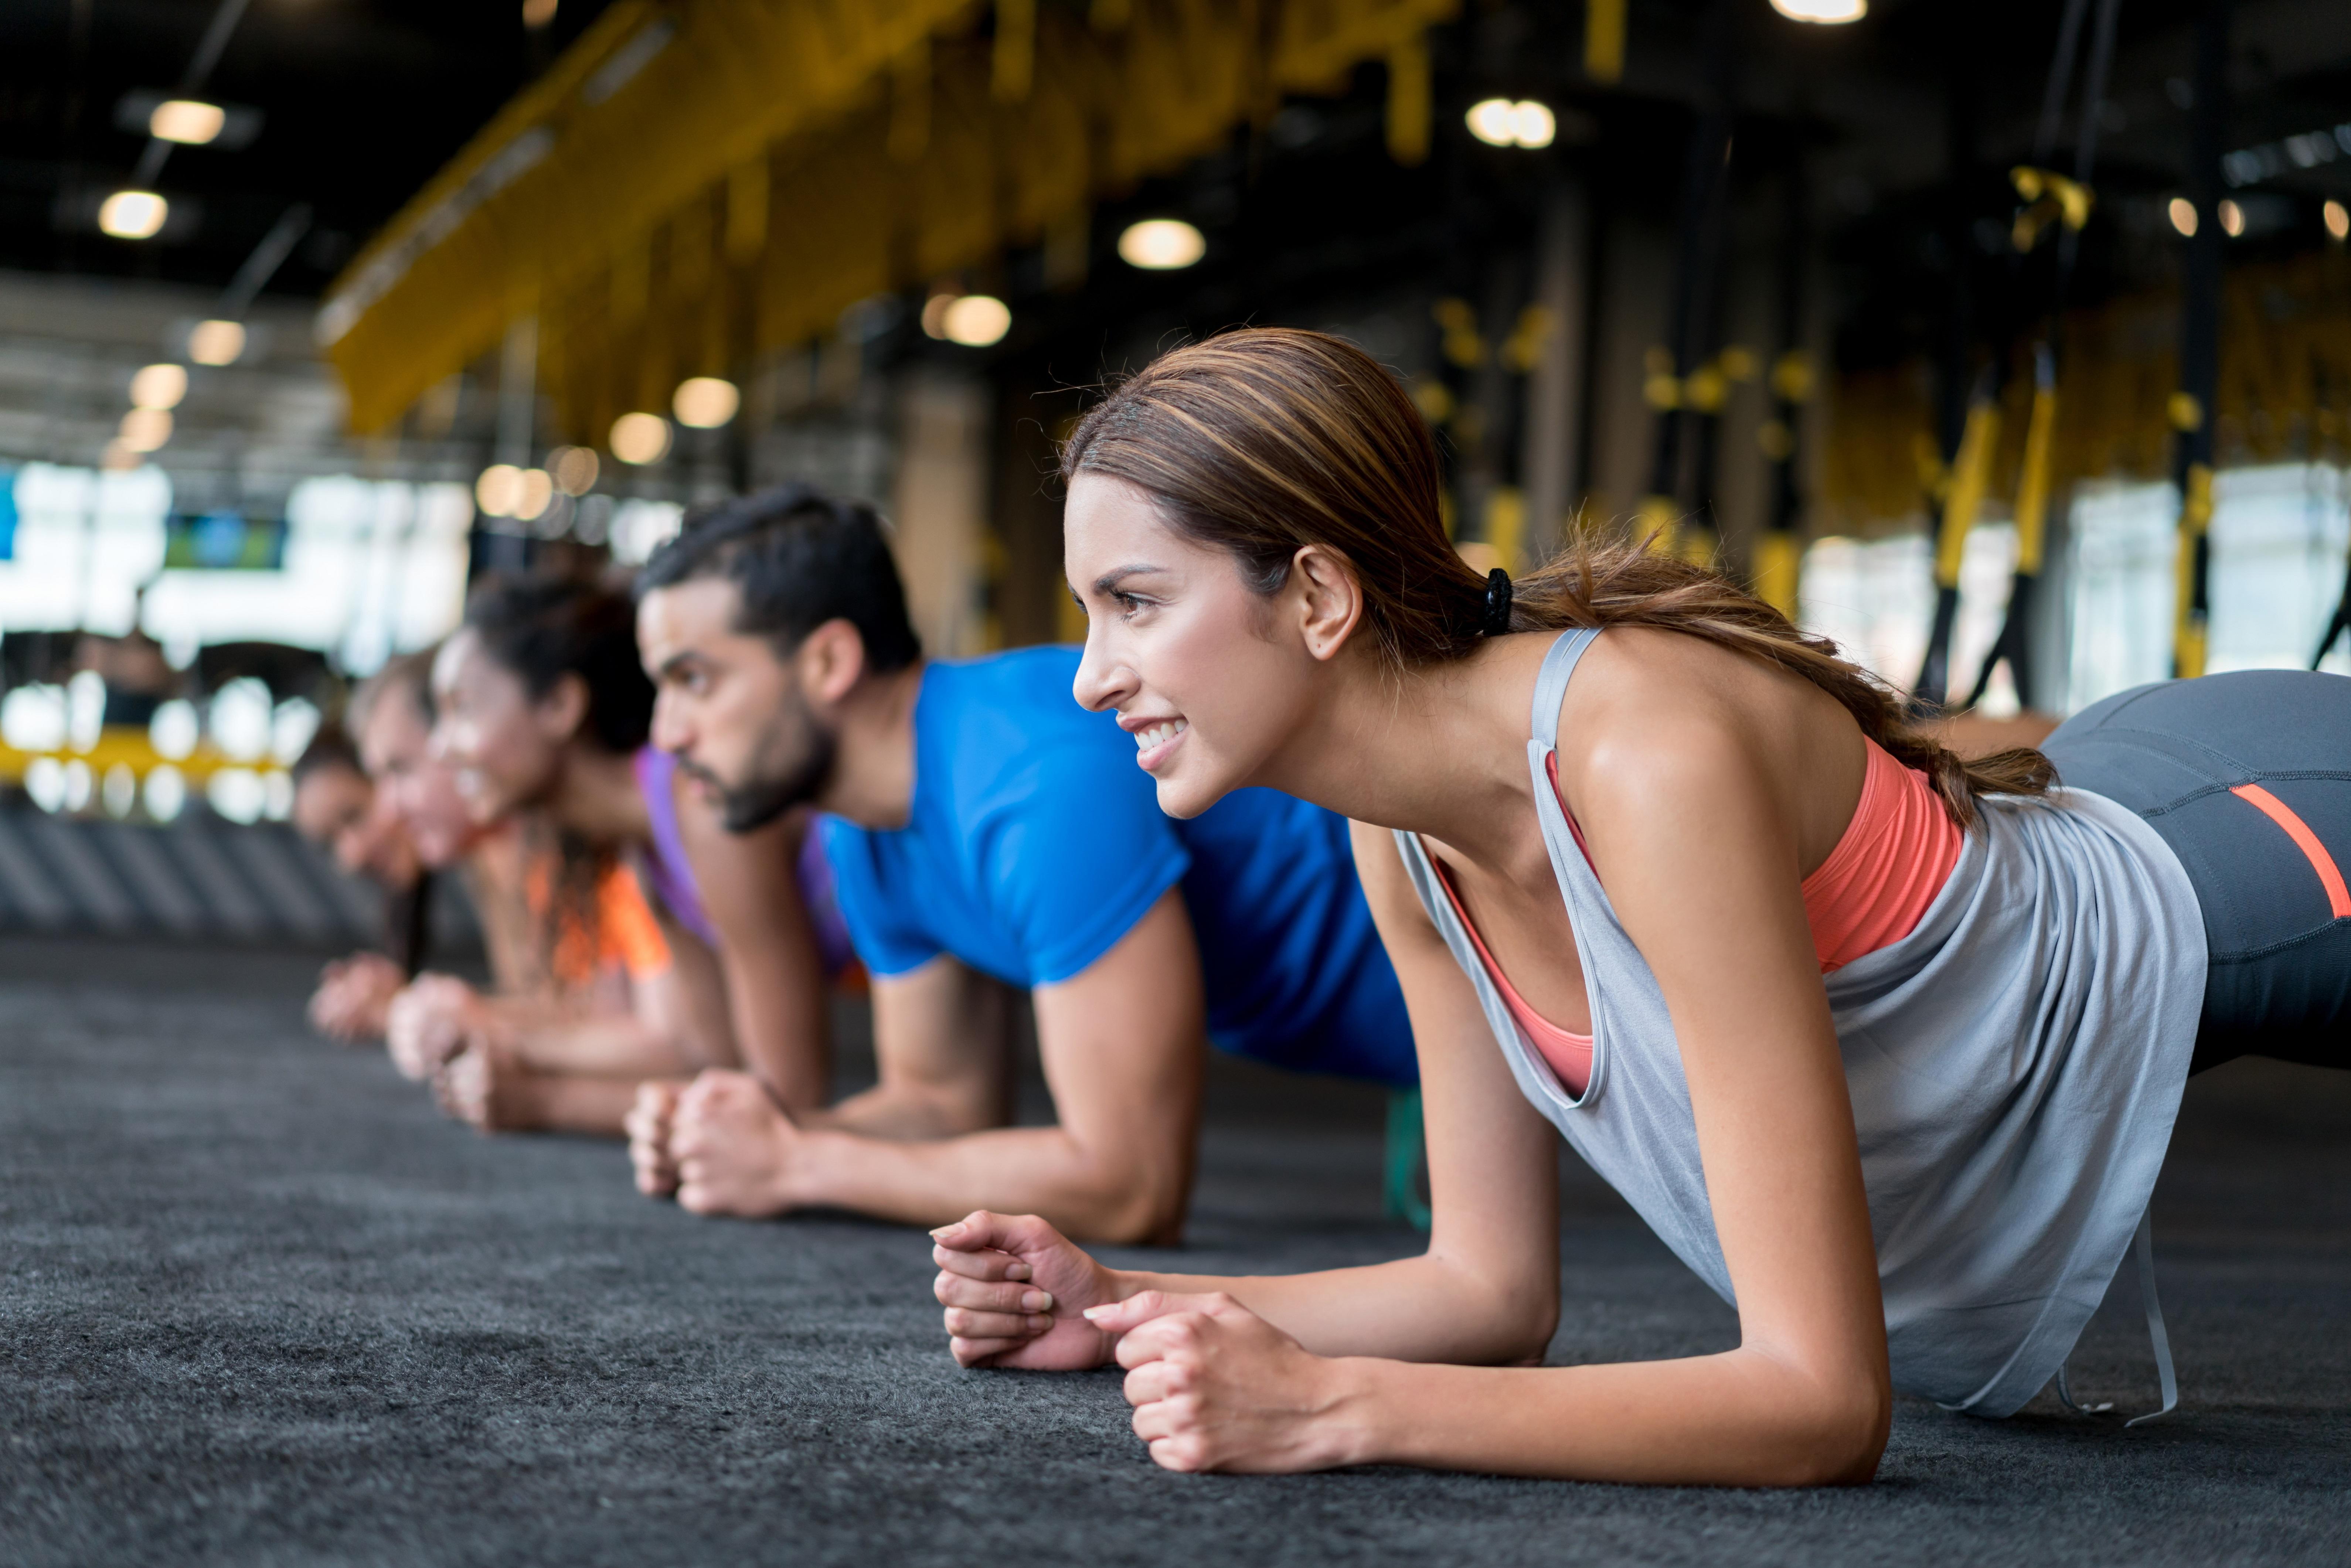 Fitness Training Sessions - Term 1 2020, Parramatta (Monday)